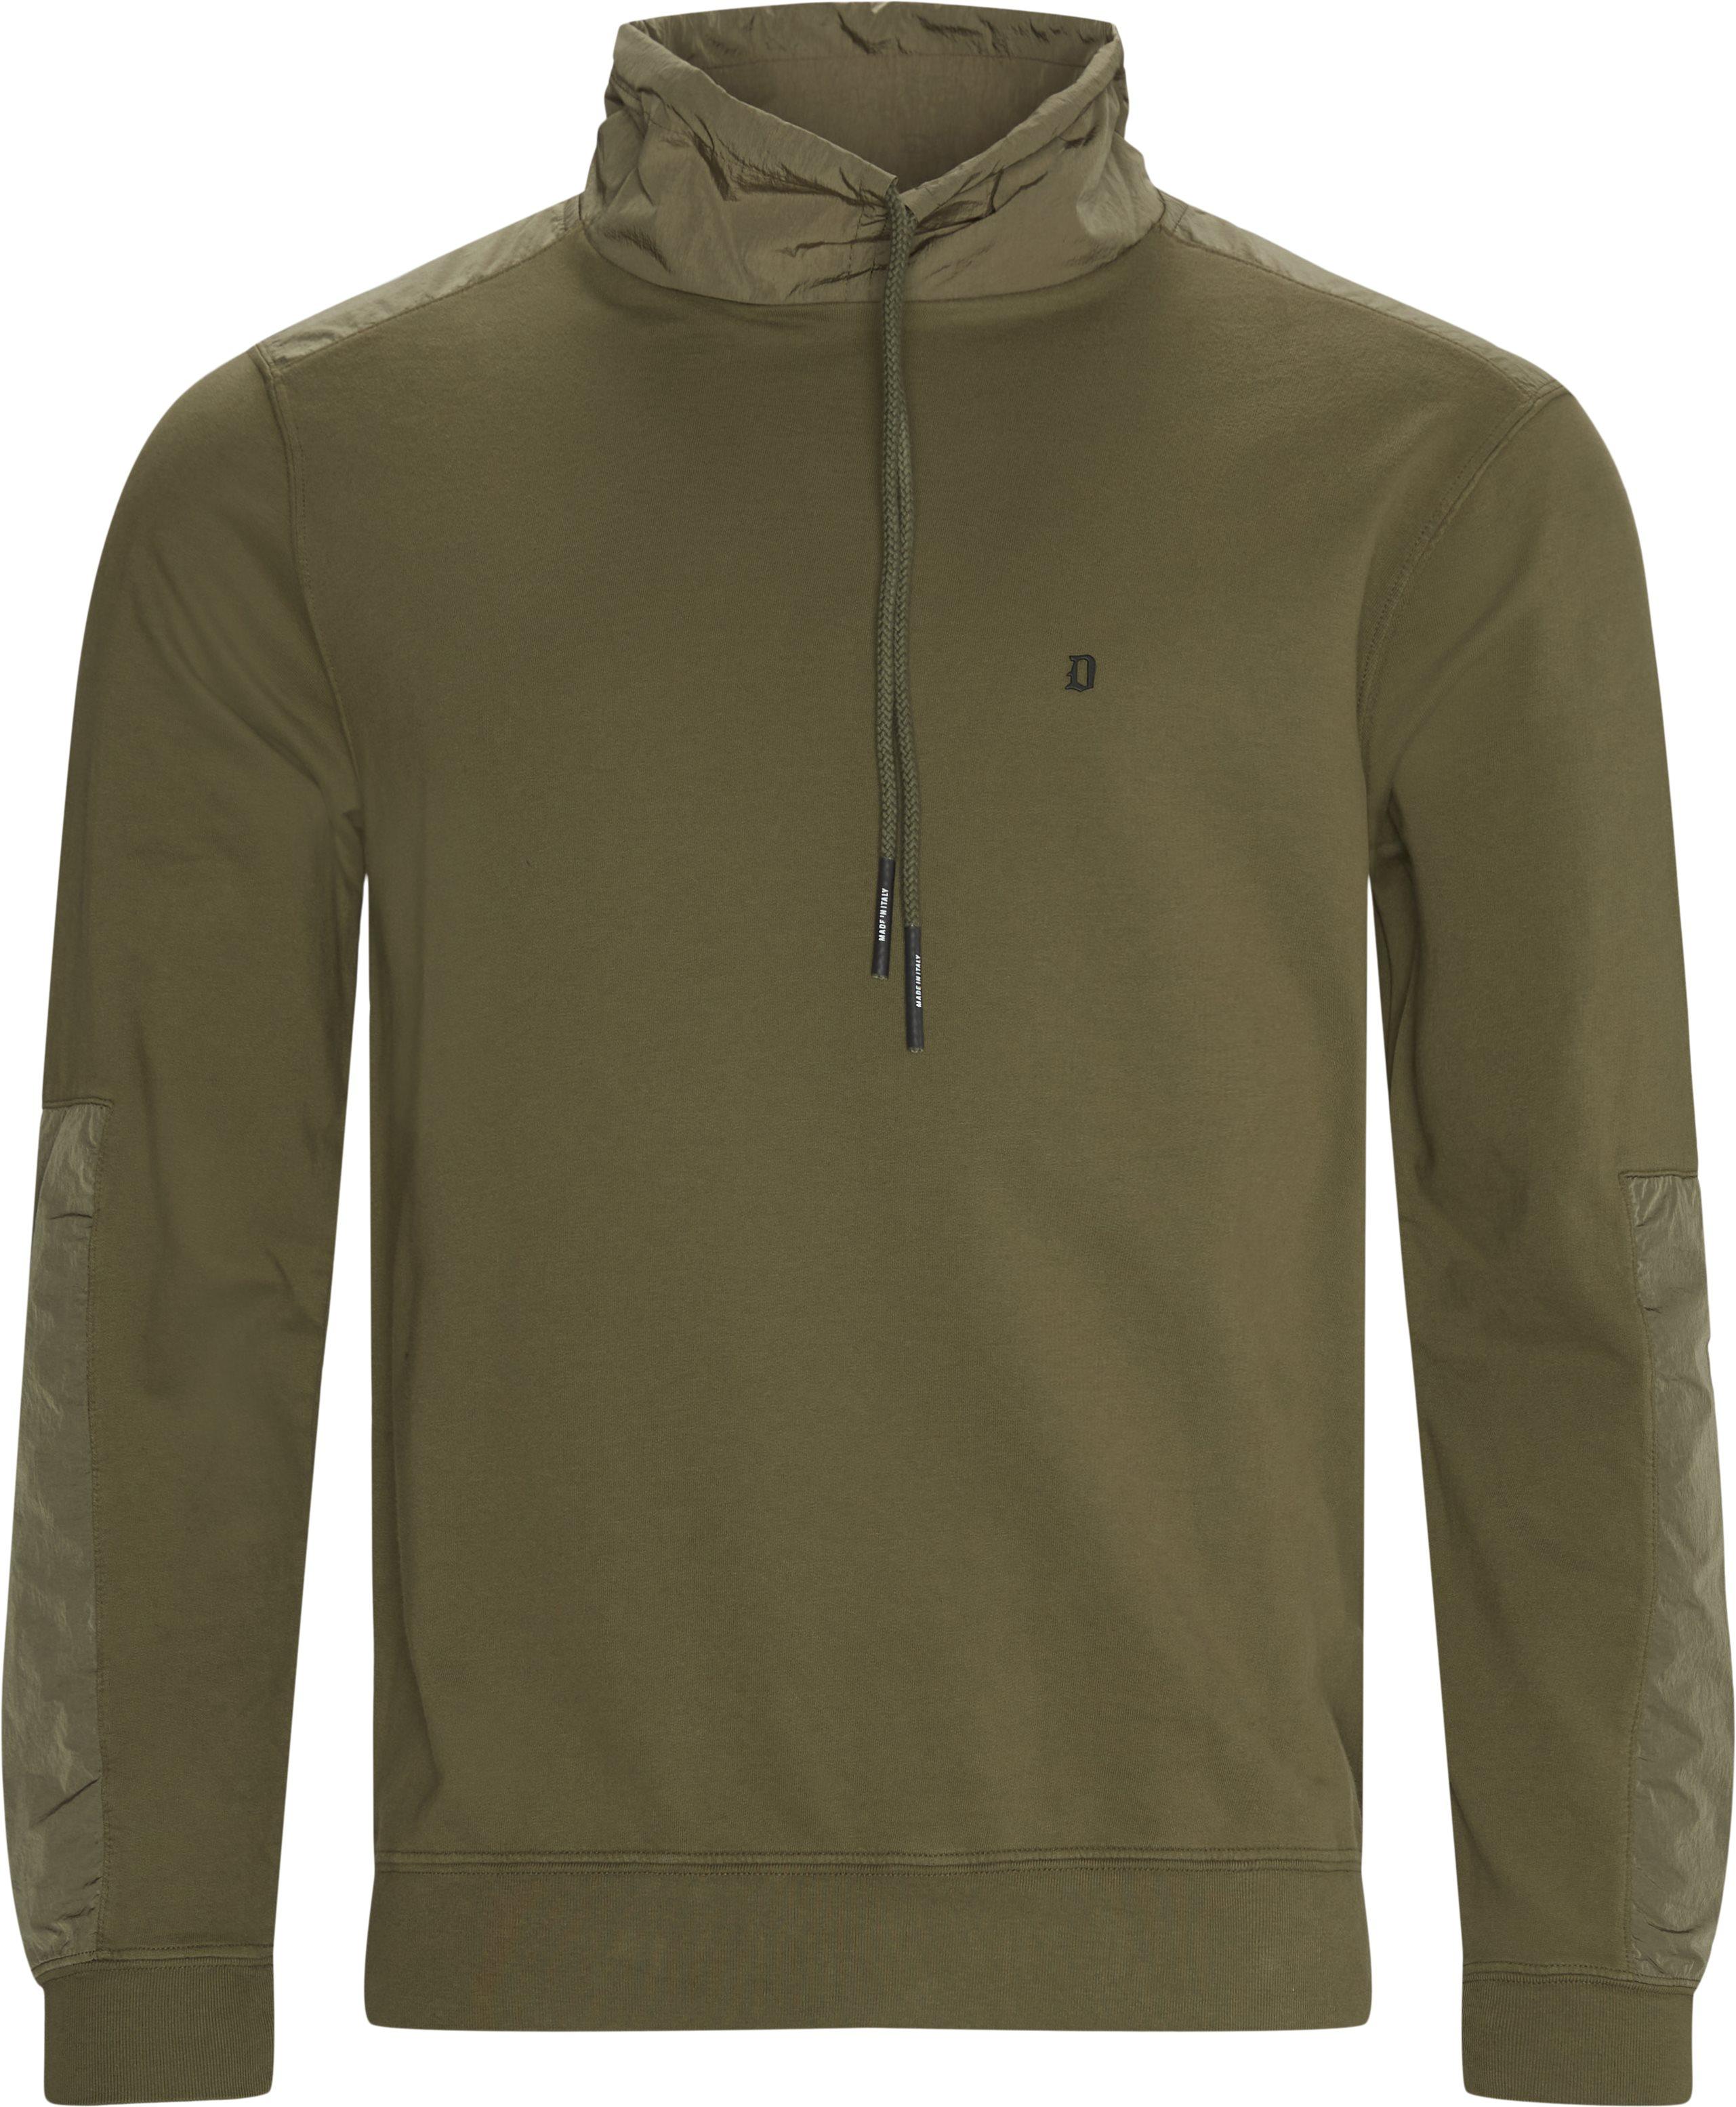 Sweatshirts - Regular fit - Army